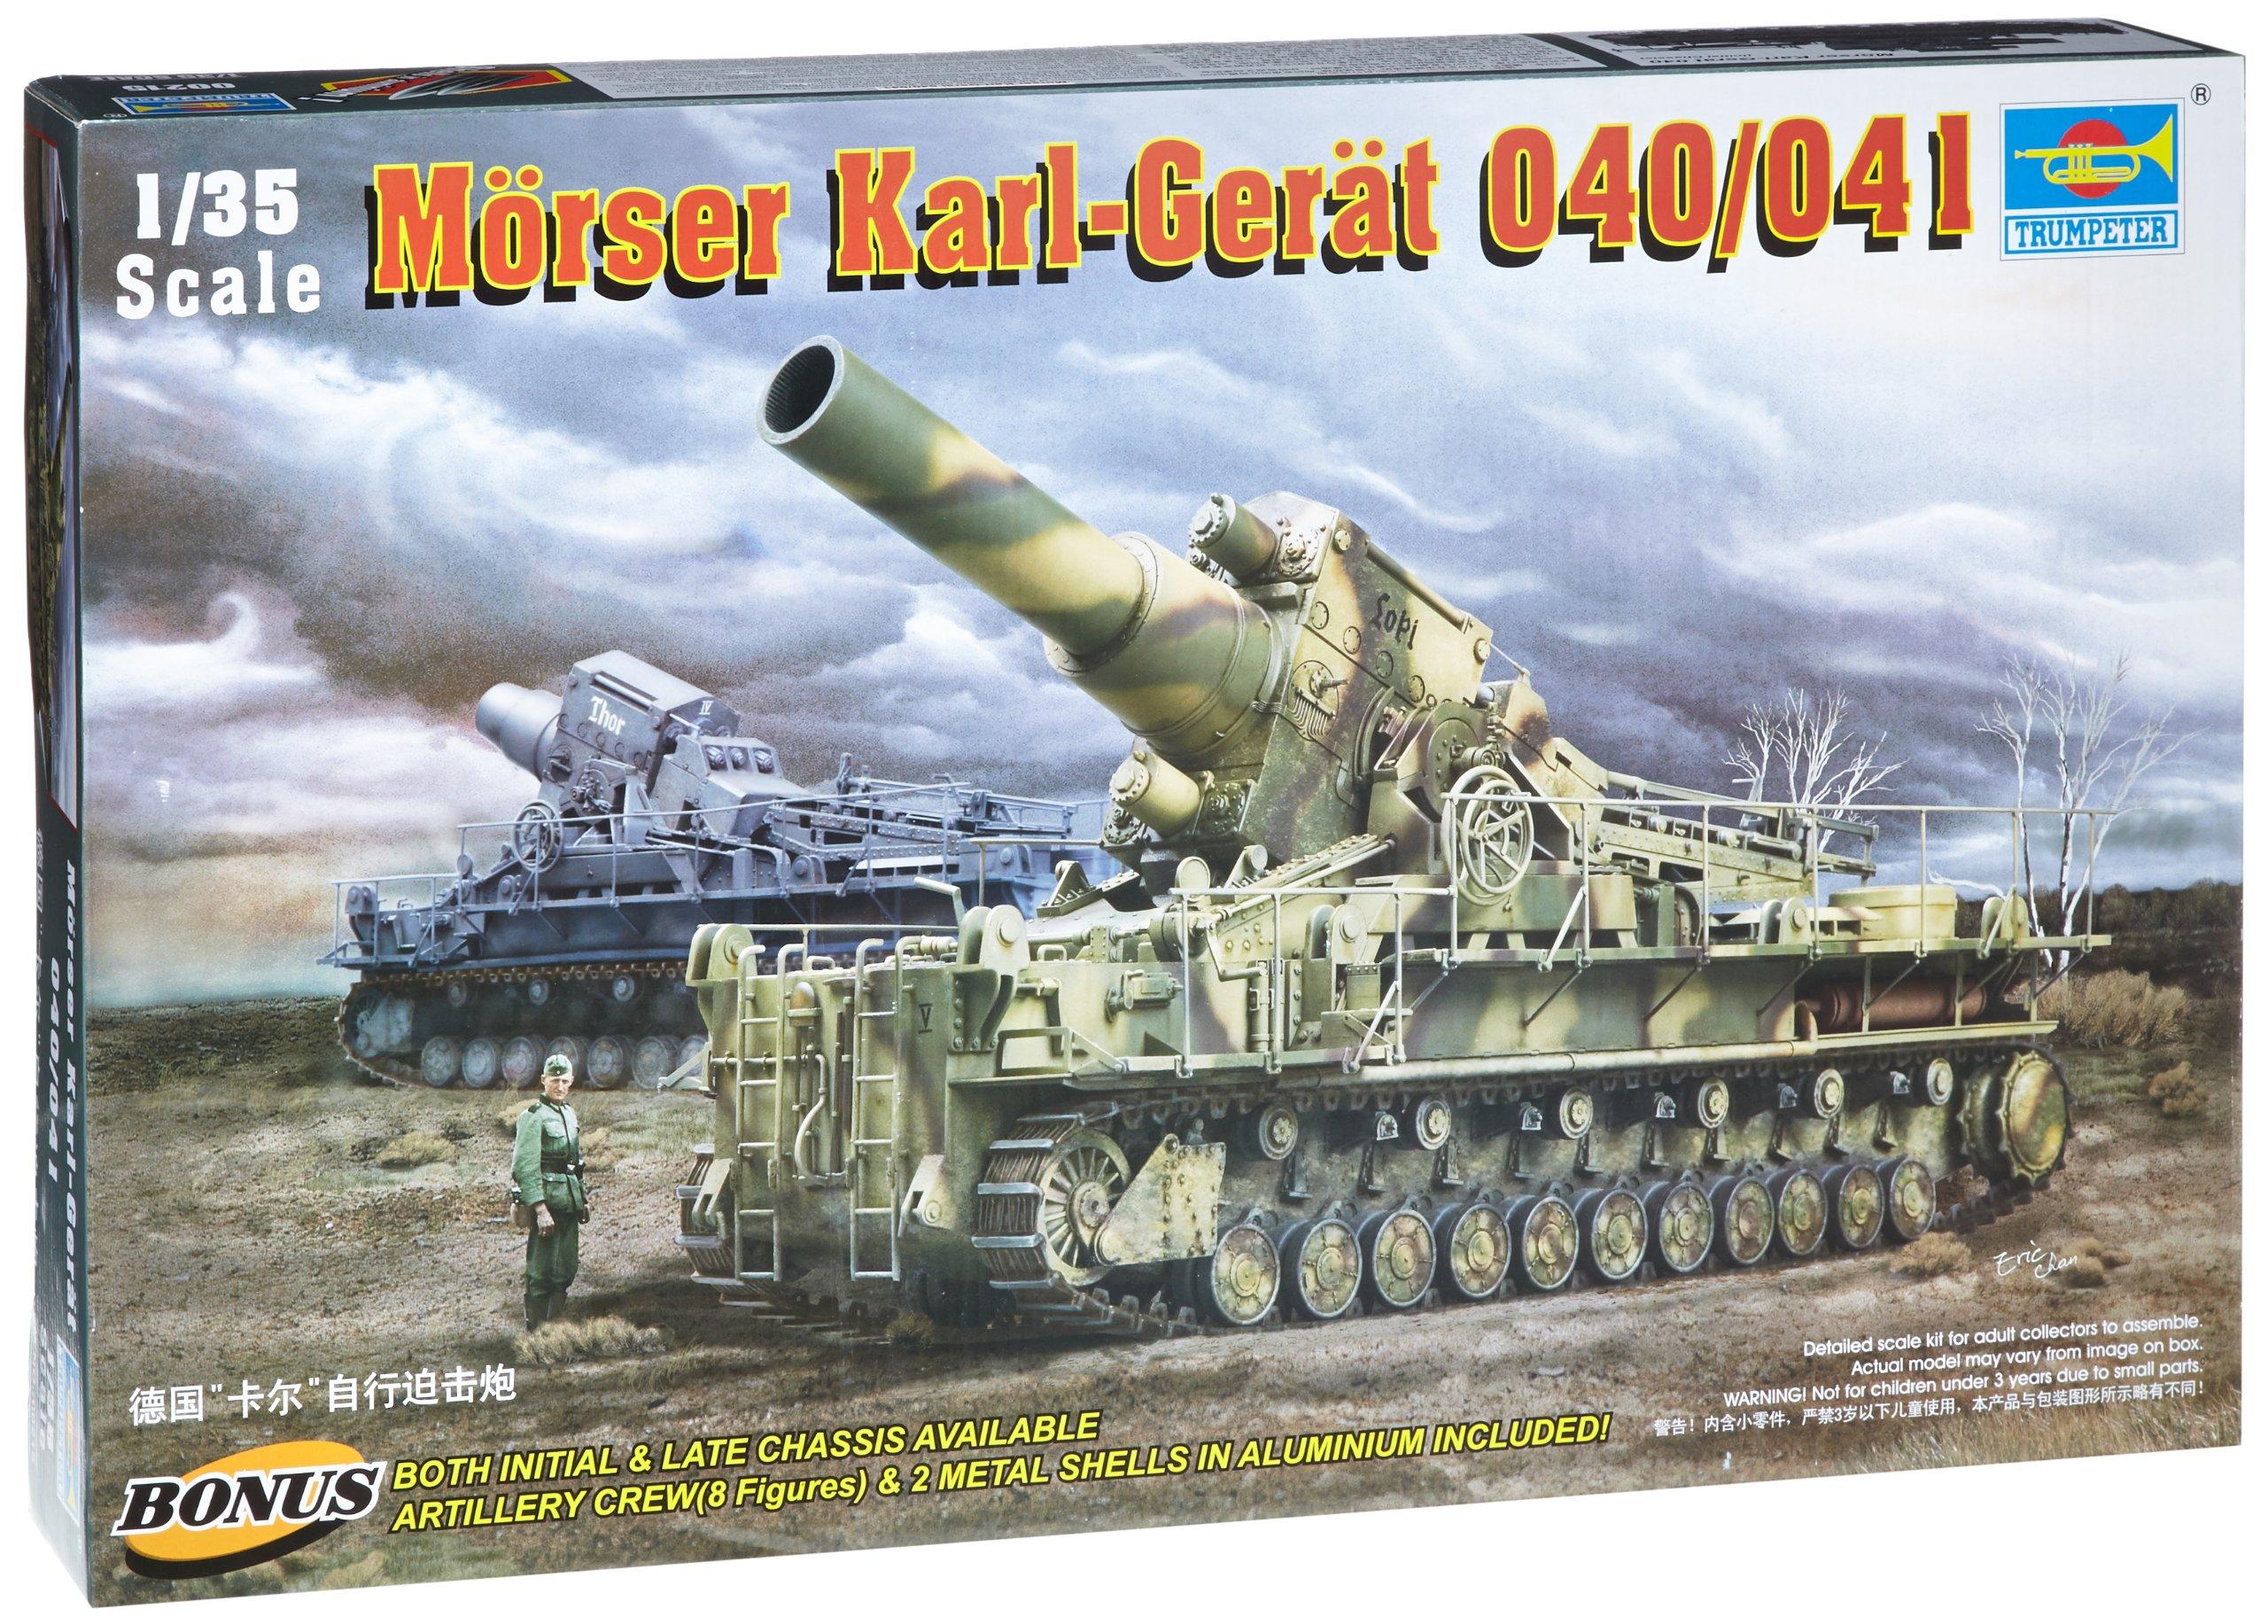 Trumpeter 1/35 Morser Karl Great 040/041 German Gun